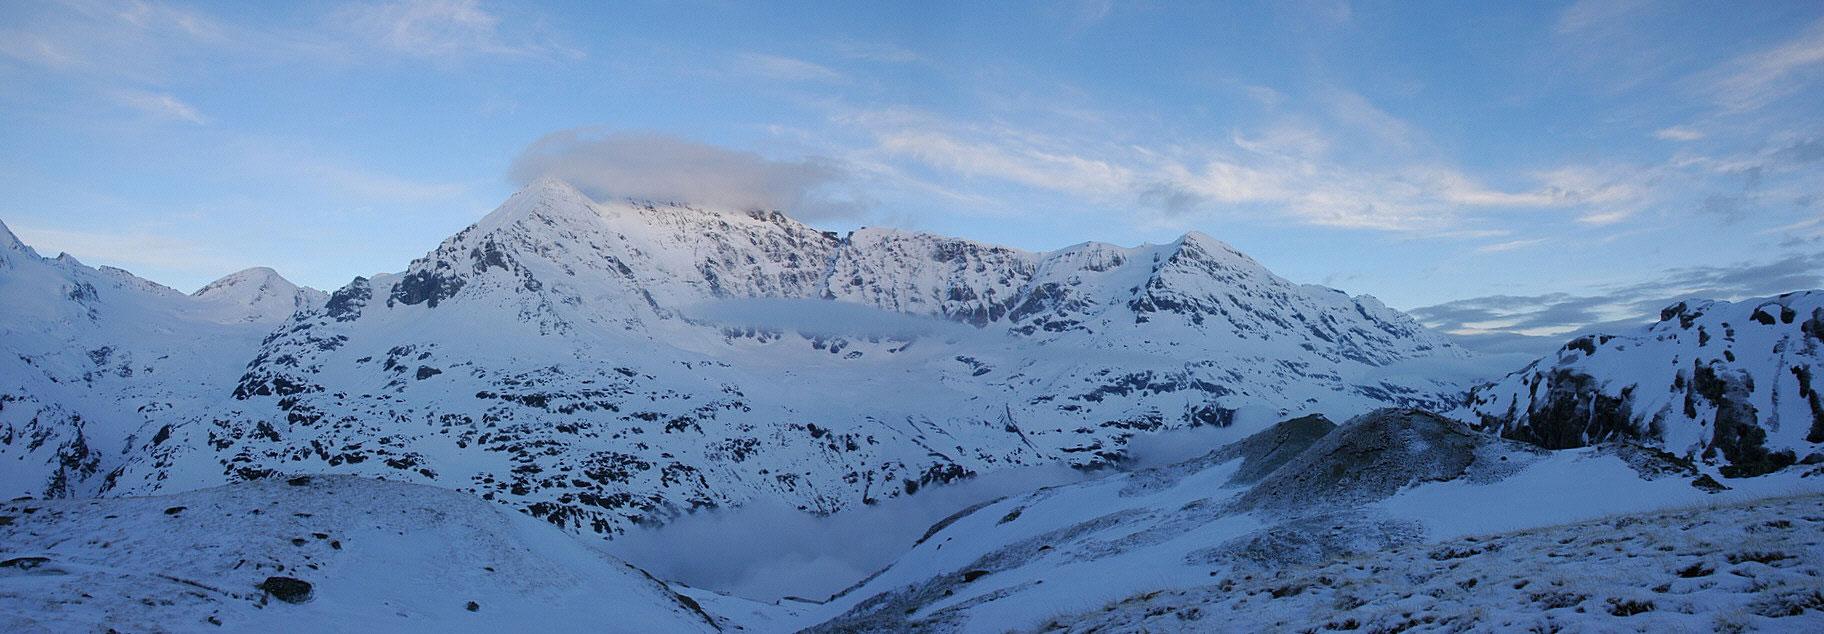 La Ruinette Walliser Alpen / Alpes valaisannes Švýcarsko panorama 10